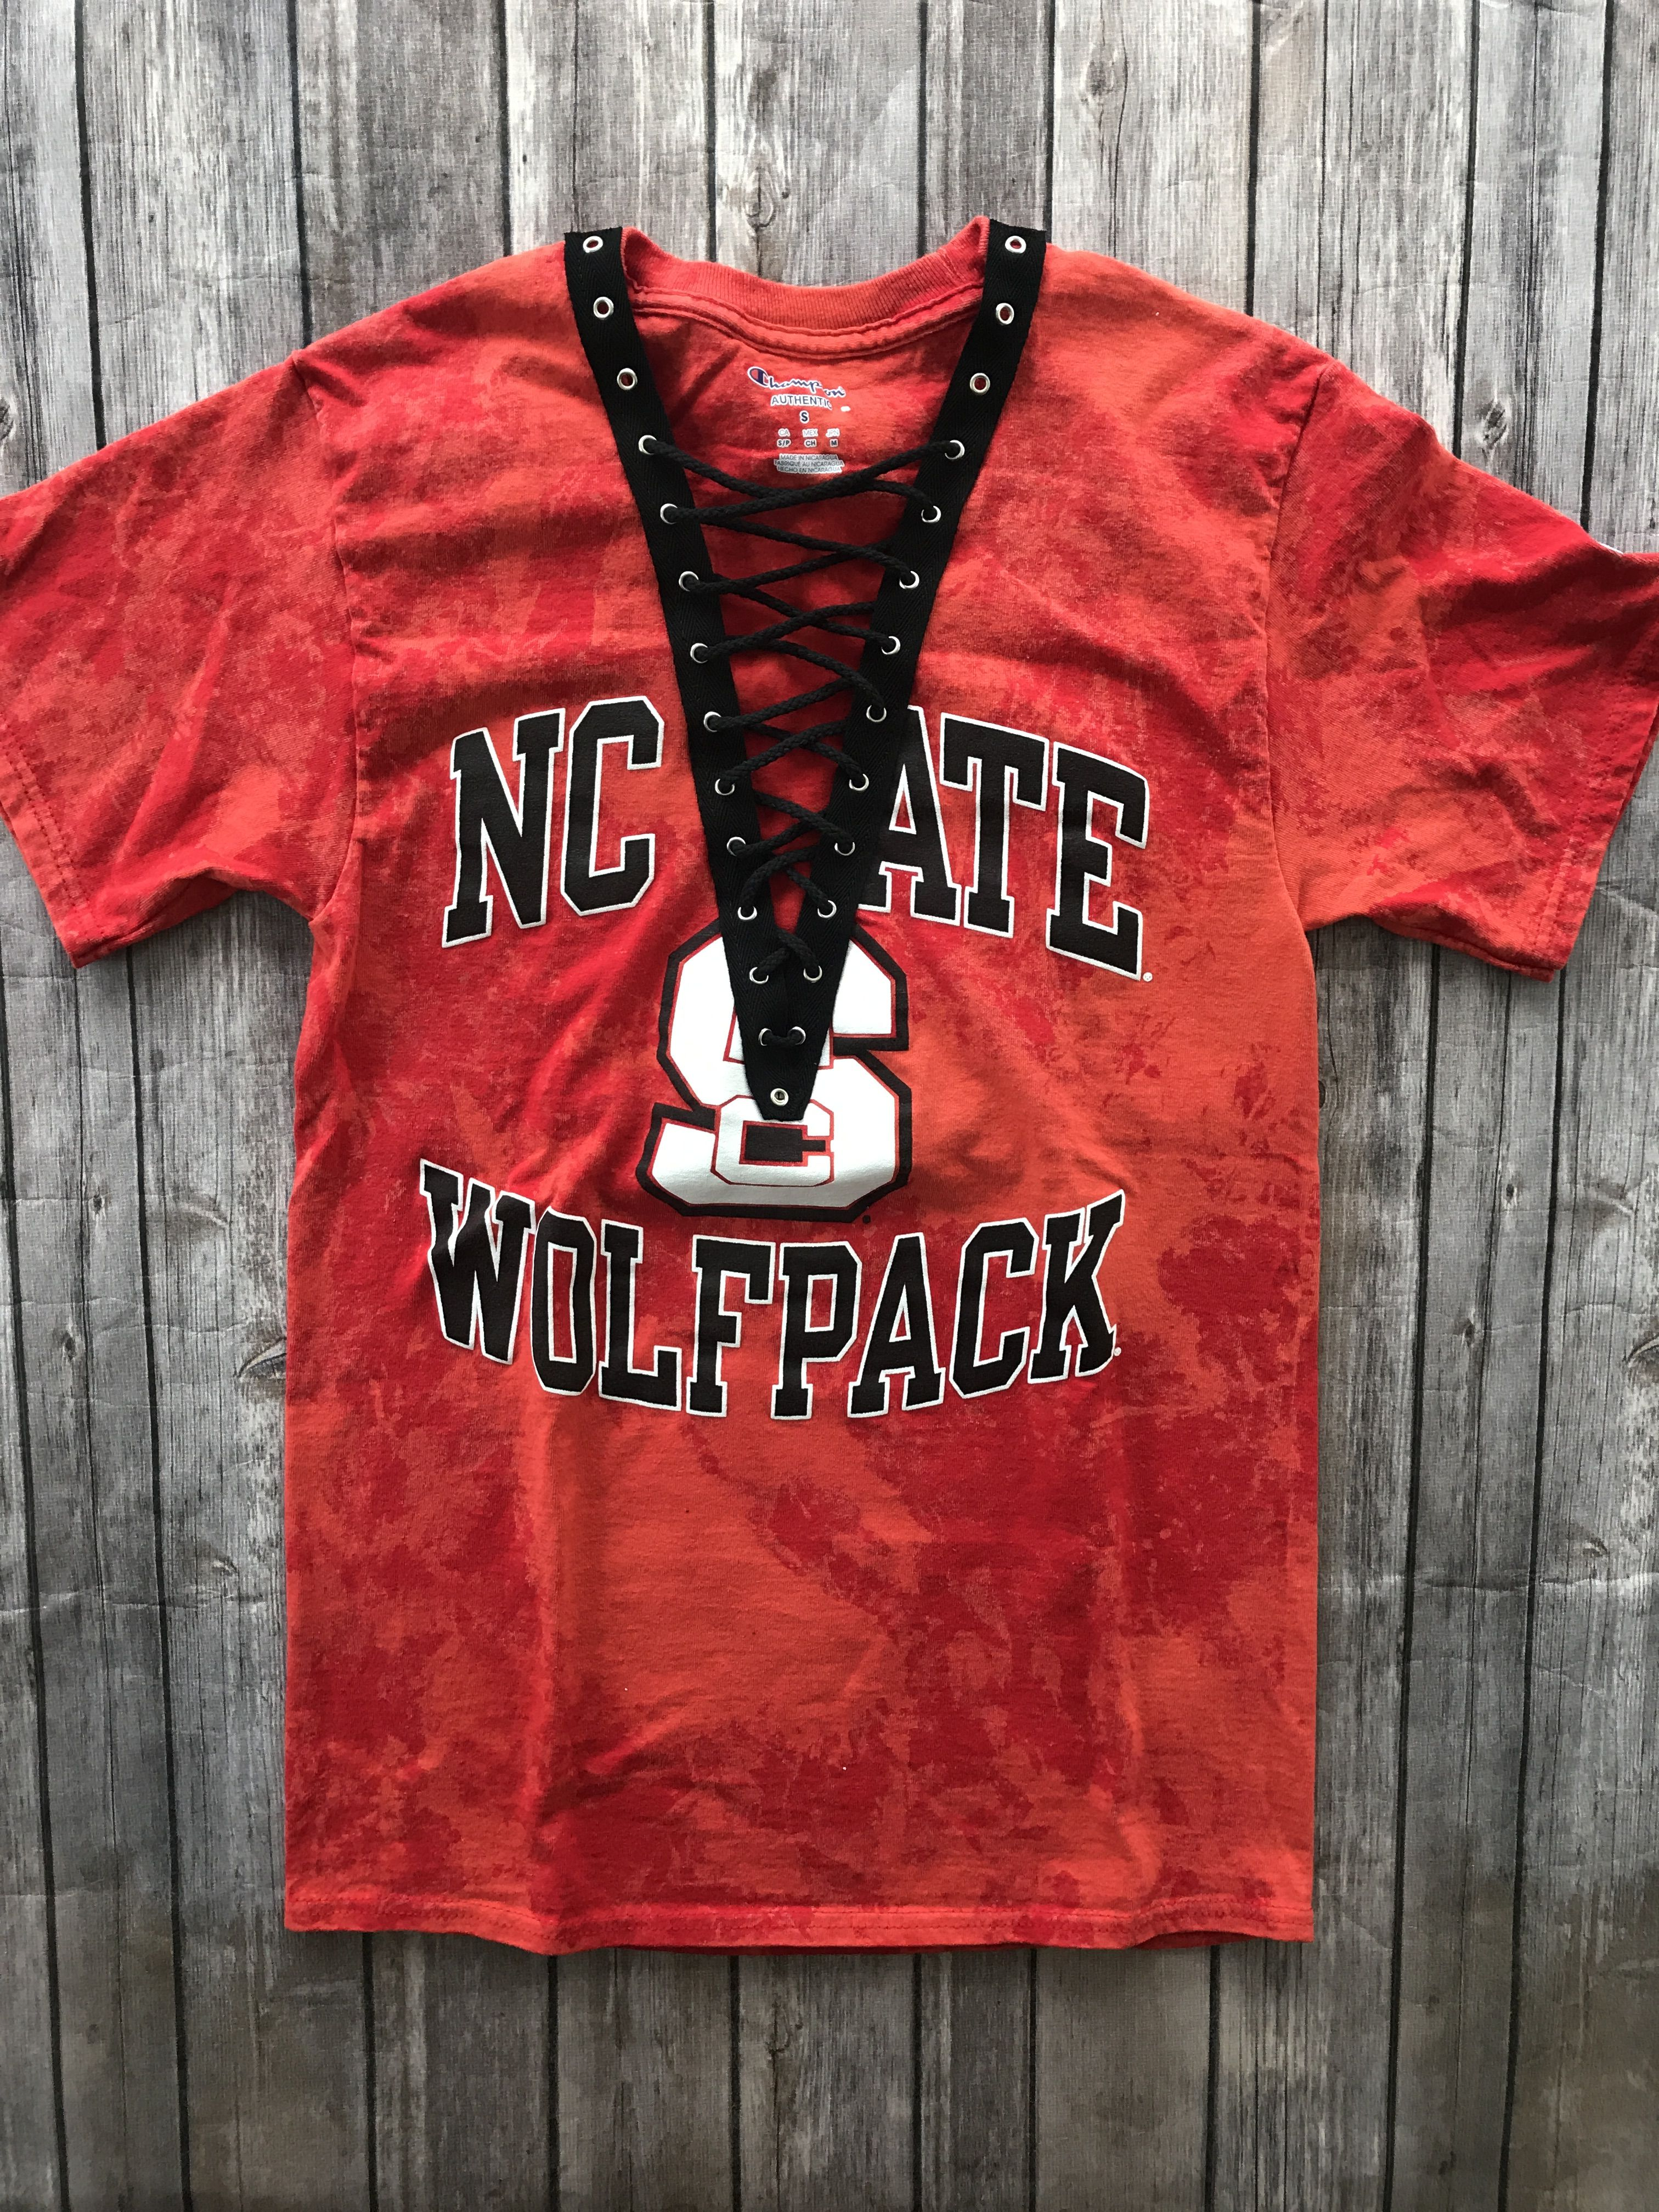 31f09634bfa82 Personalized College T Shirts